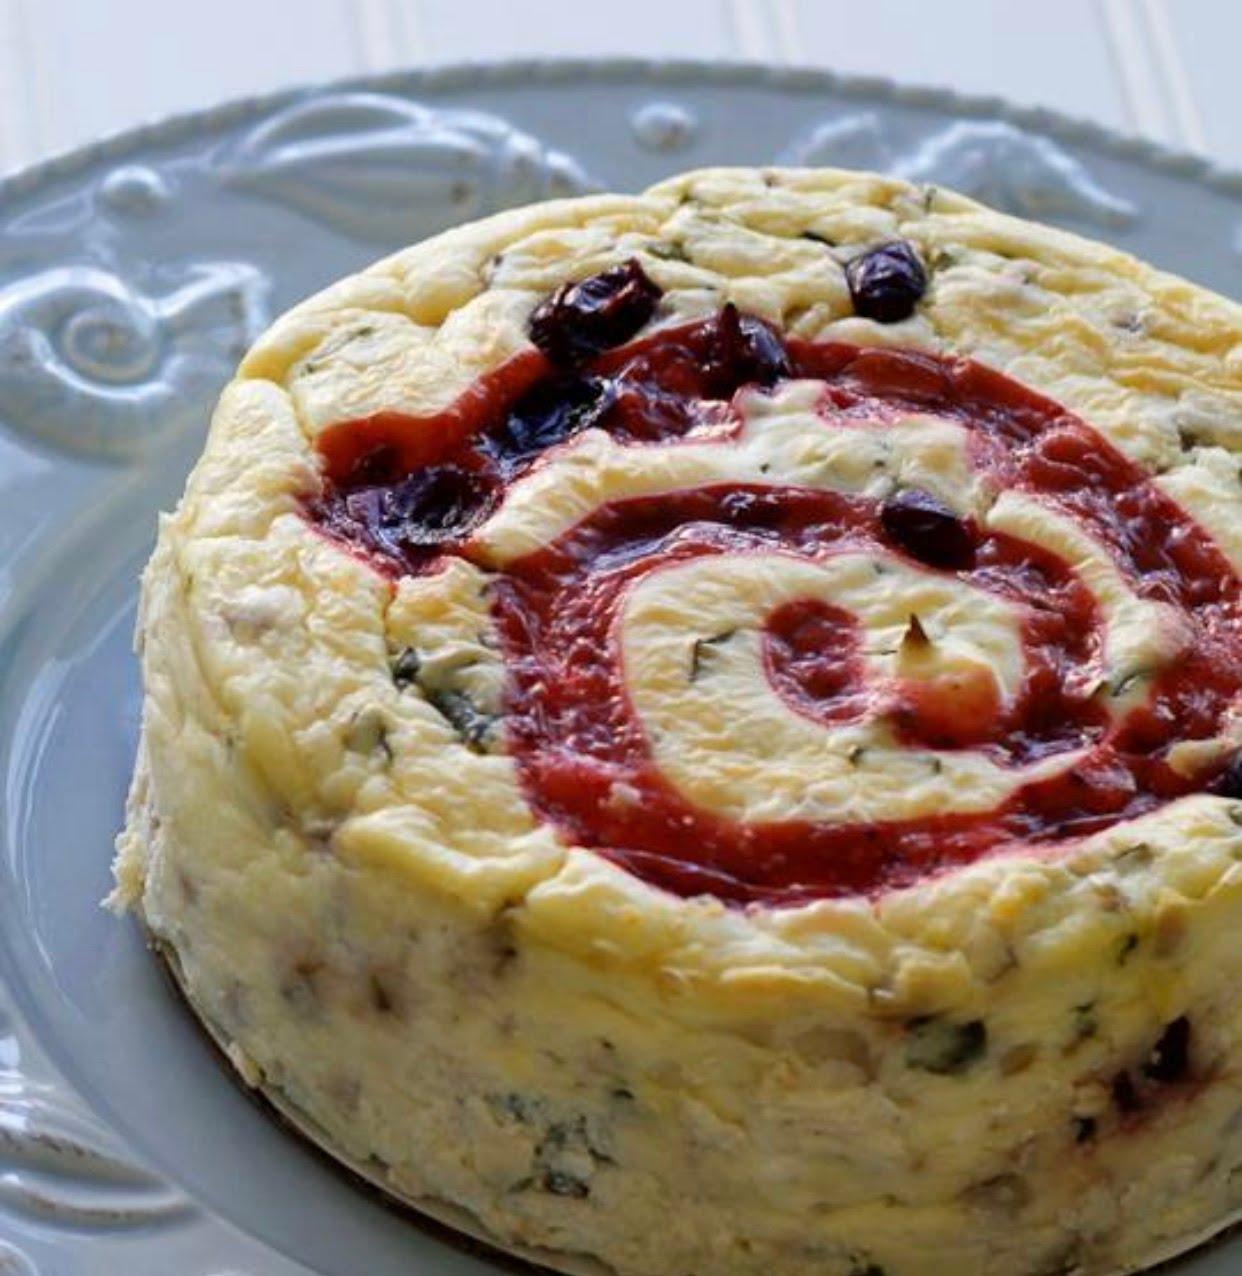 Wicked Kickin' Savory Cheesecakes image 0